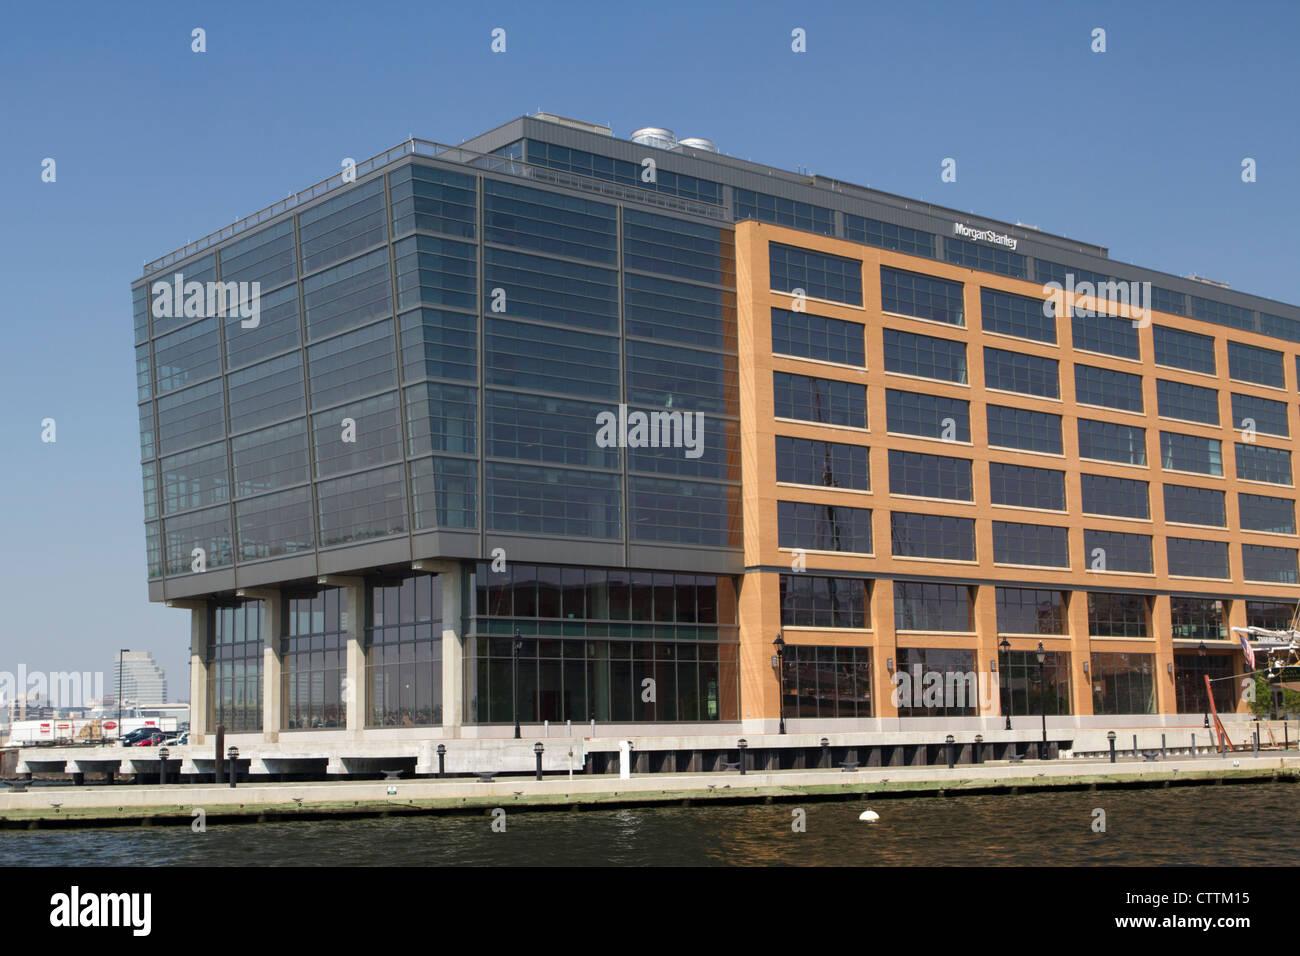 Brokerage Office Stock Photos & Brokerage Office Stock Images - Alamy